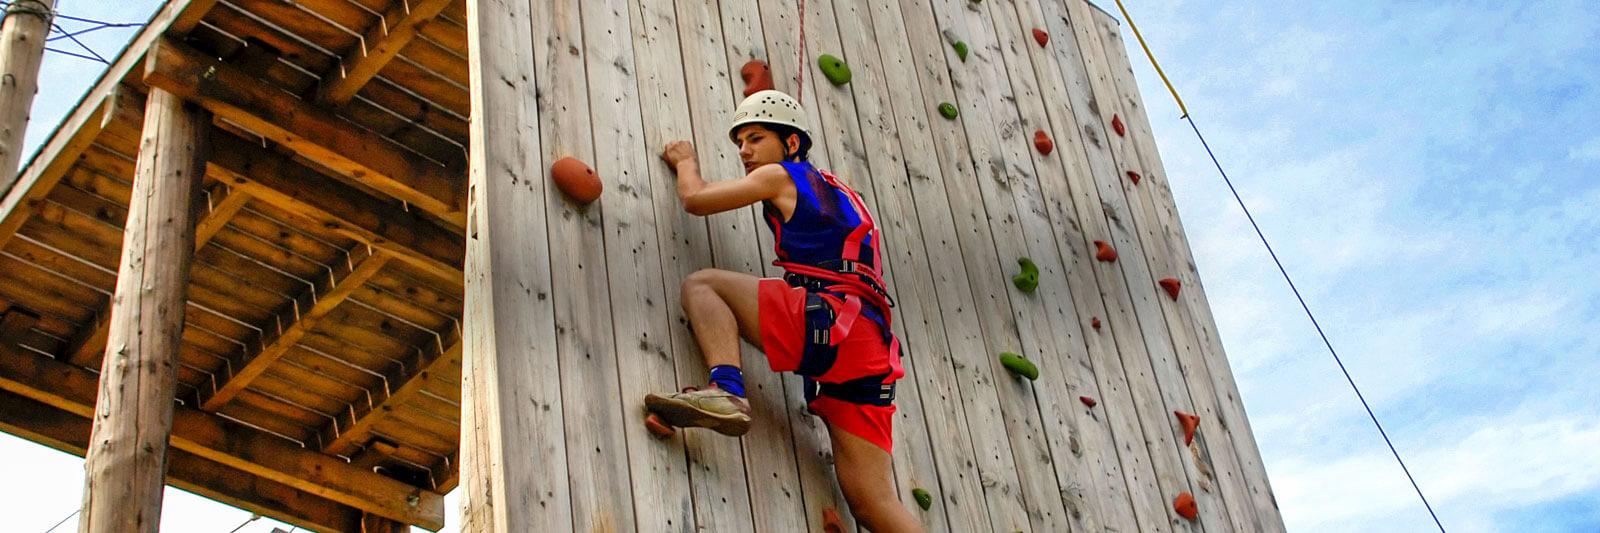 Amicalola Falls Adventure Lodge Adventures Climbing Wall 1 1